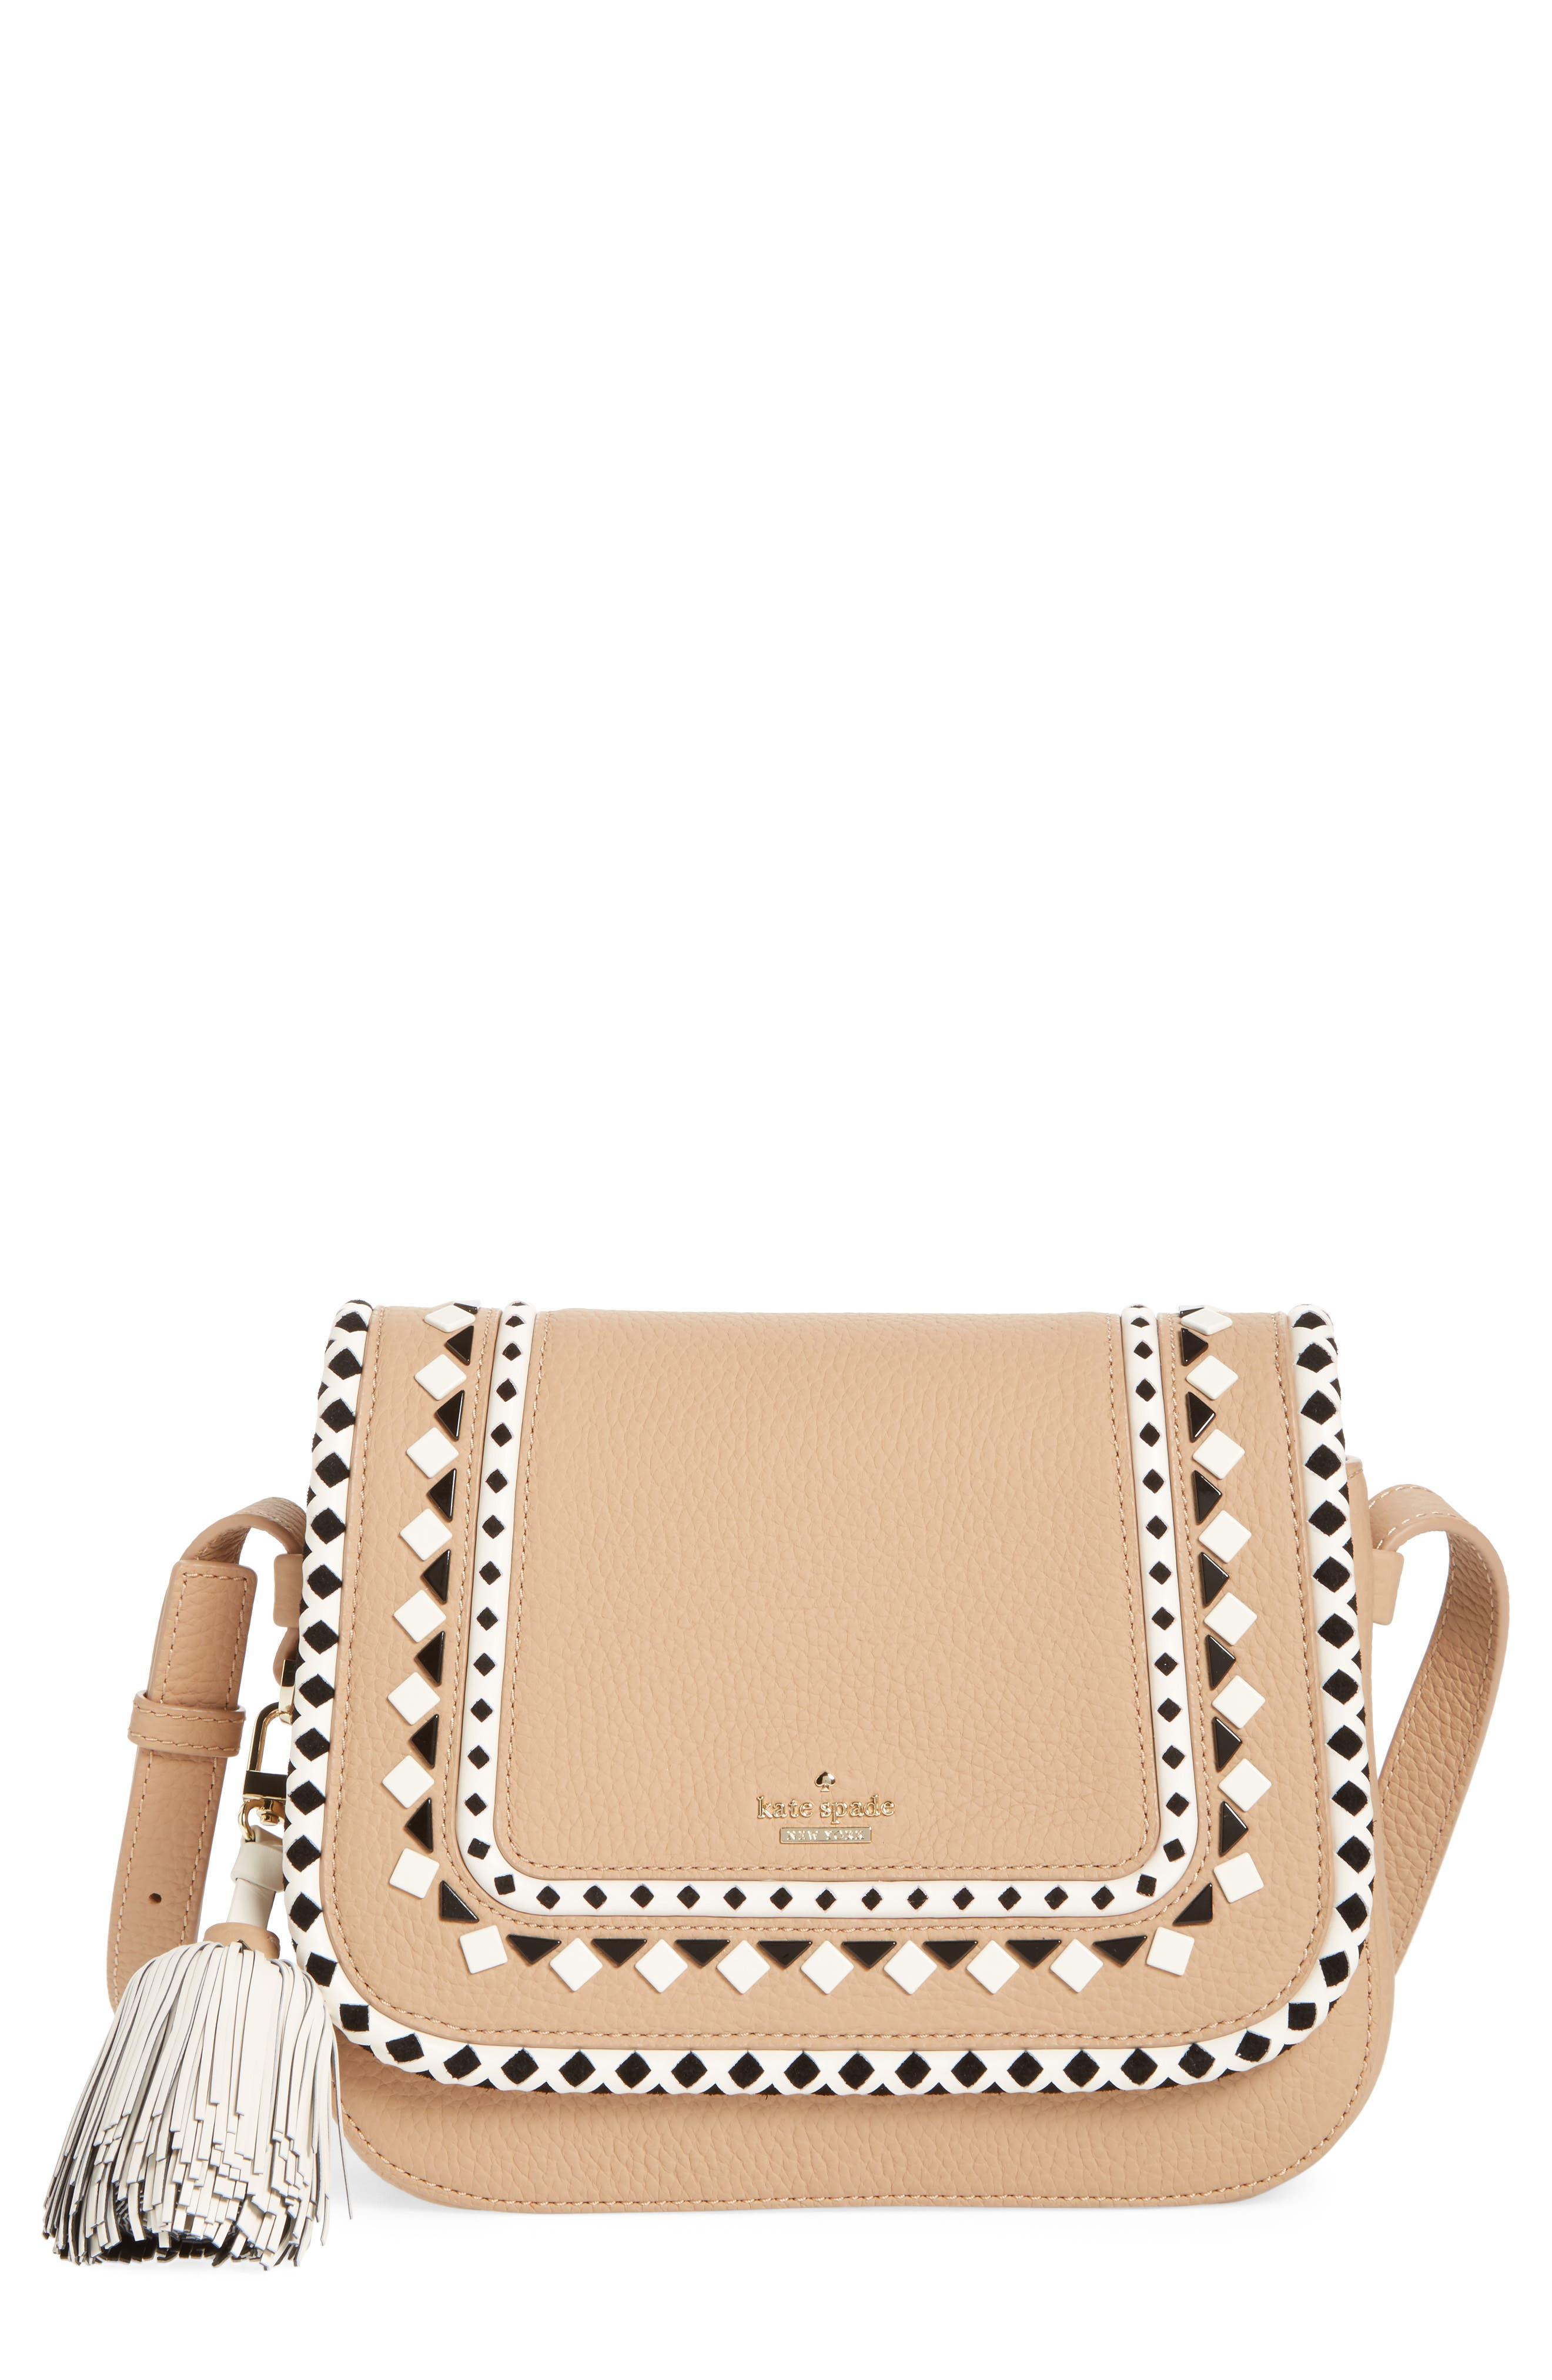 crown street - jasper leather saddle bag,                             Main thumbnail 1, color,                             248